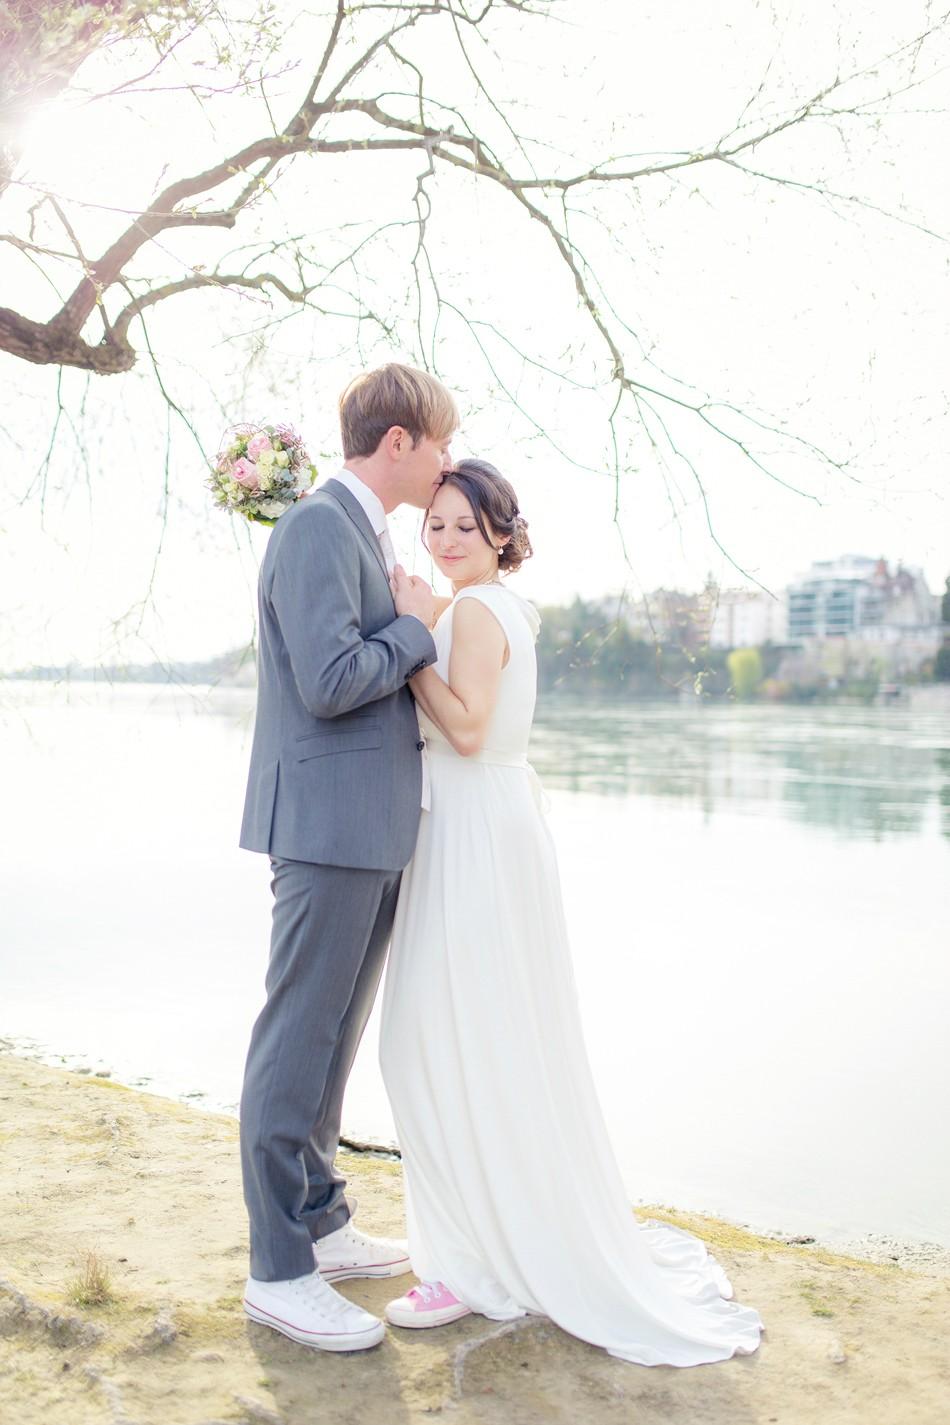 Brautpaarshooting-Inseli-Vintage-Fotograf-Vintage (1 von 4)